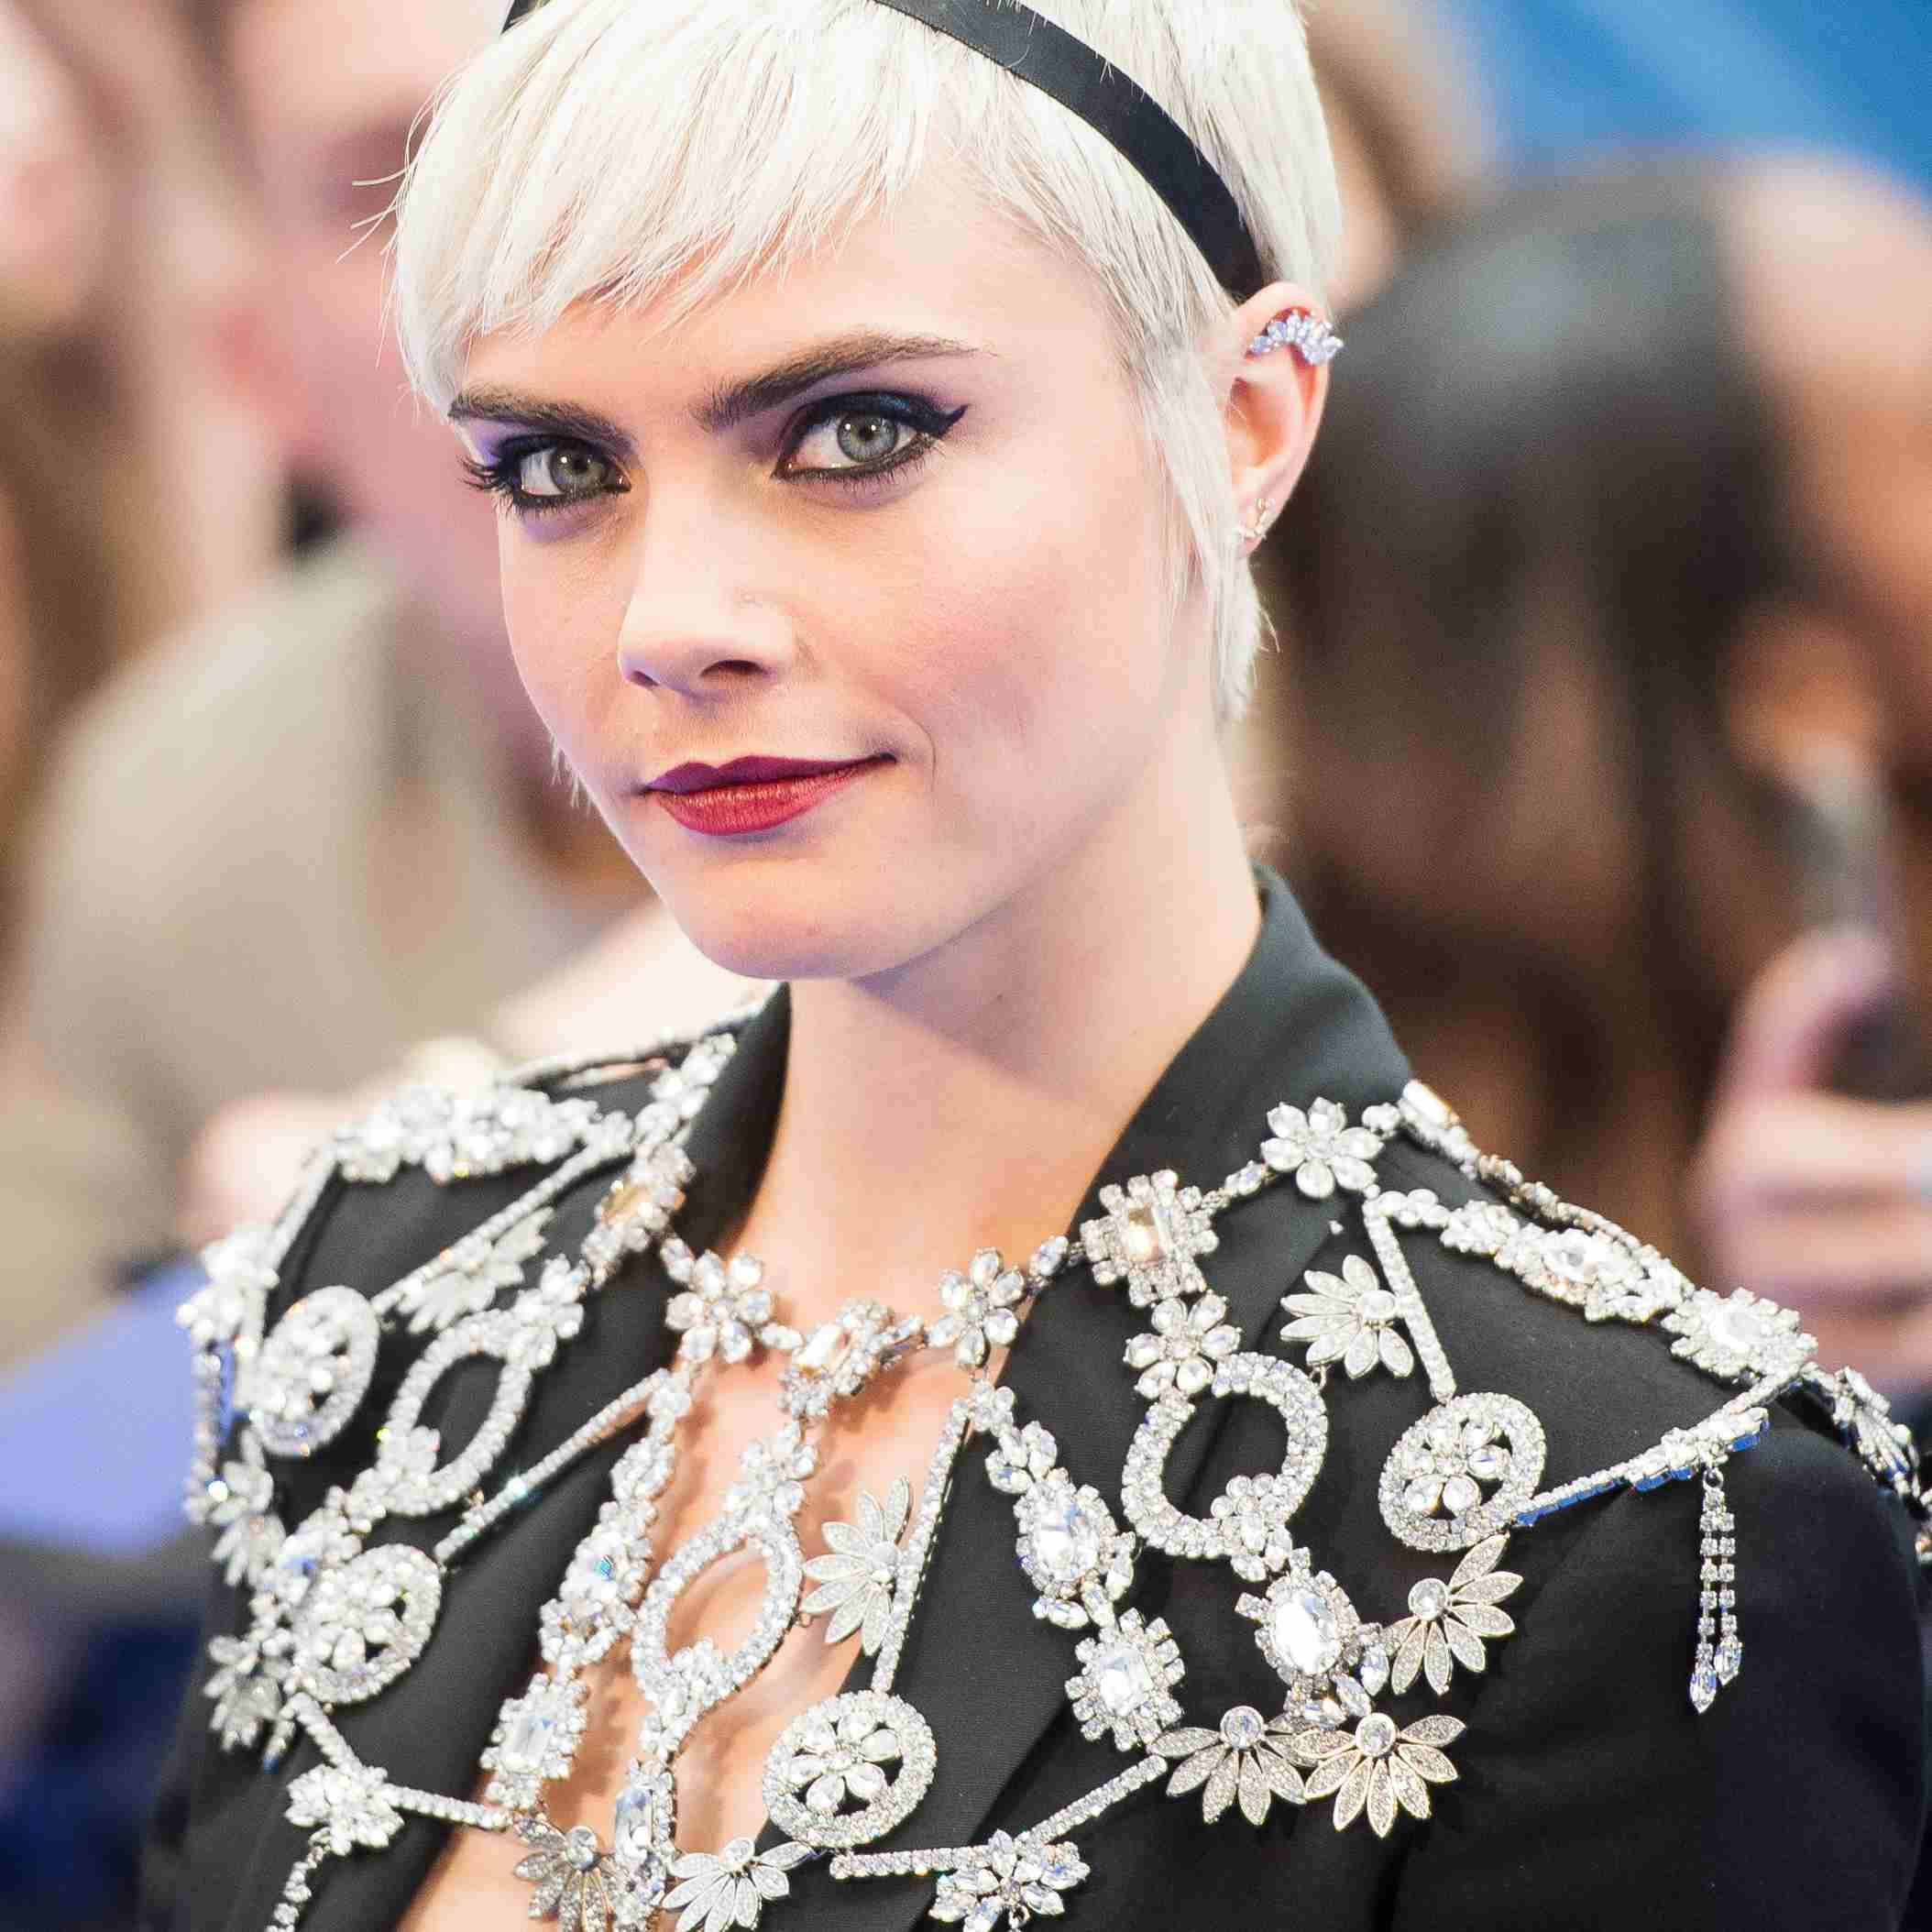 Cara Delevingne pixie cut with a headband